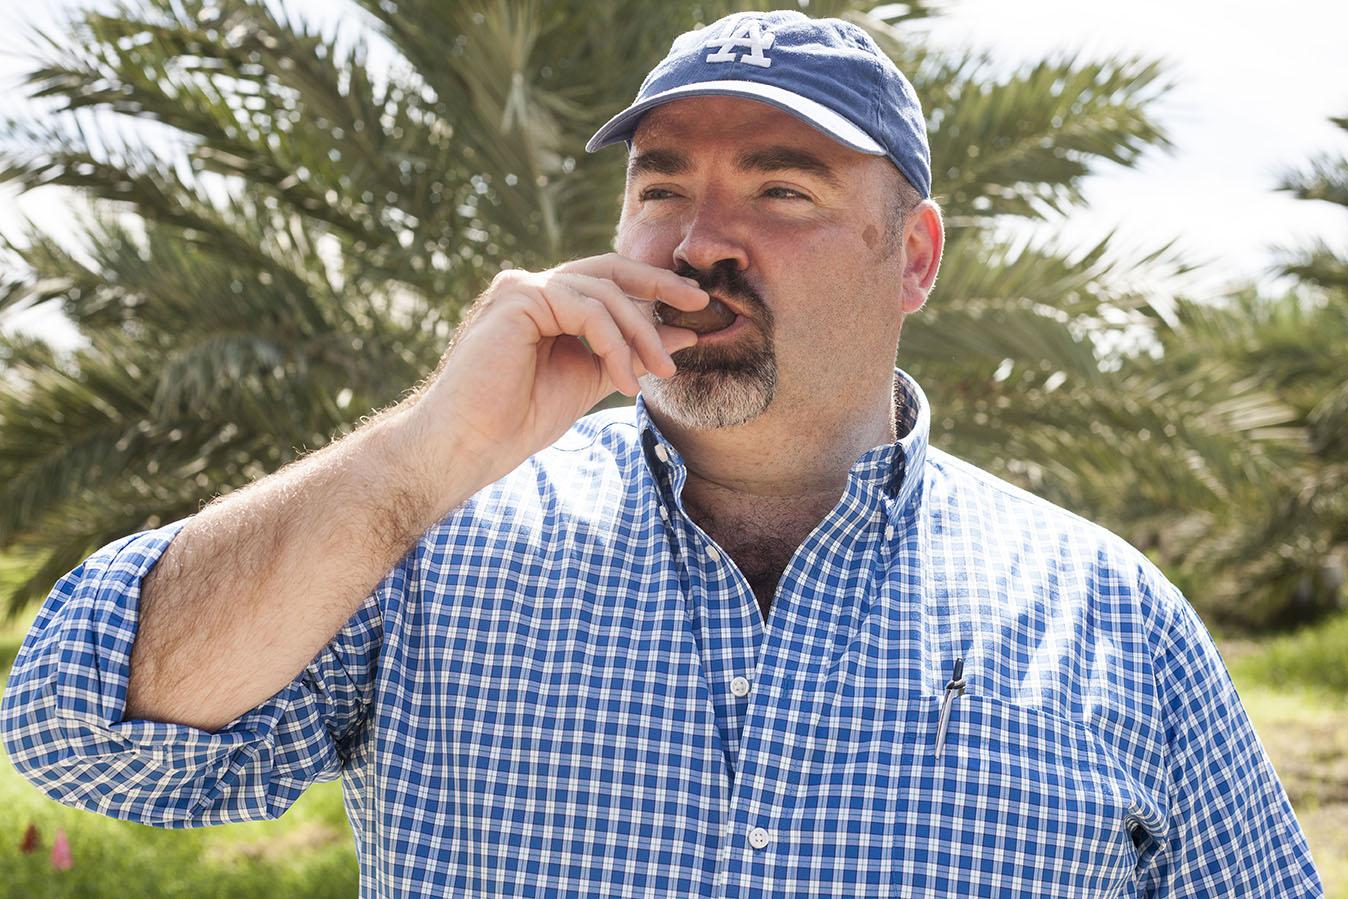 Neil Davey eats a freshly picked Medijool Date